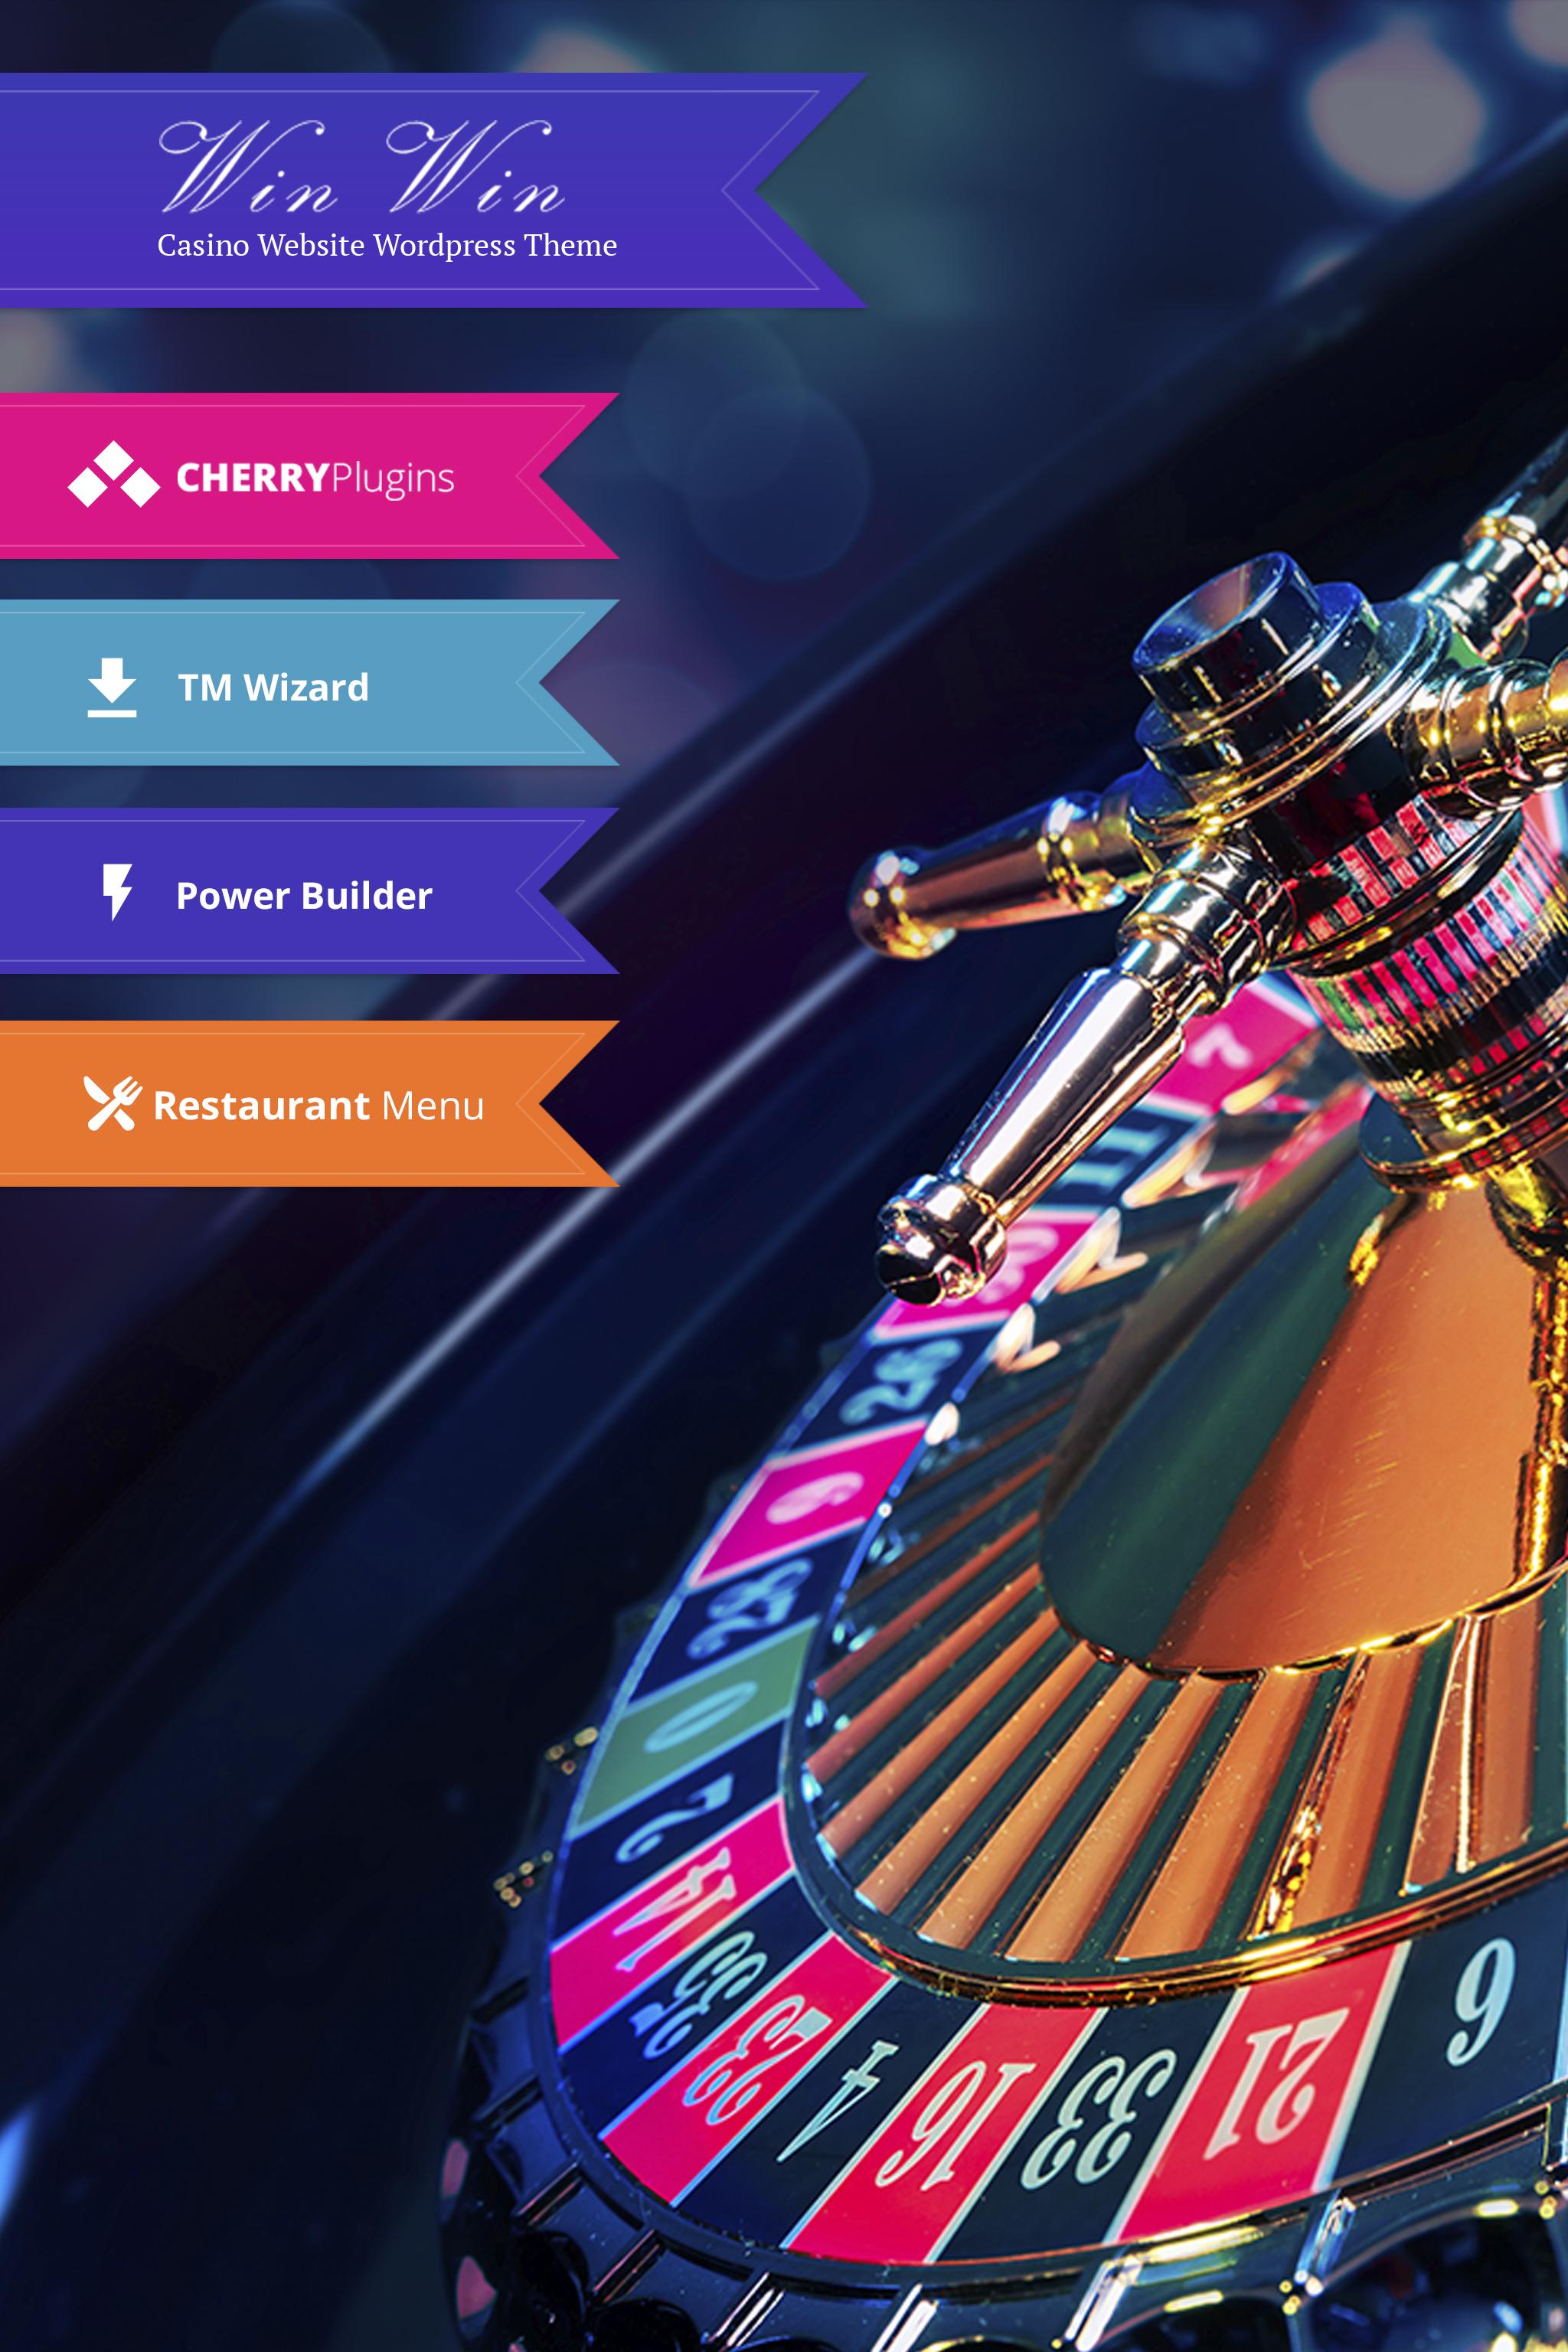 WinWin - Casino Website WordPress Theme WordPress Theme